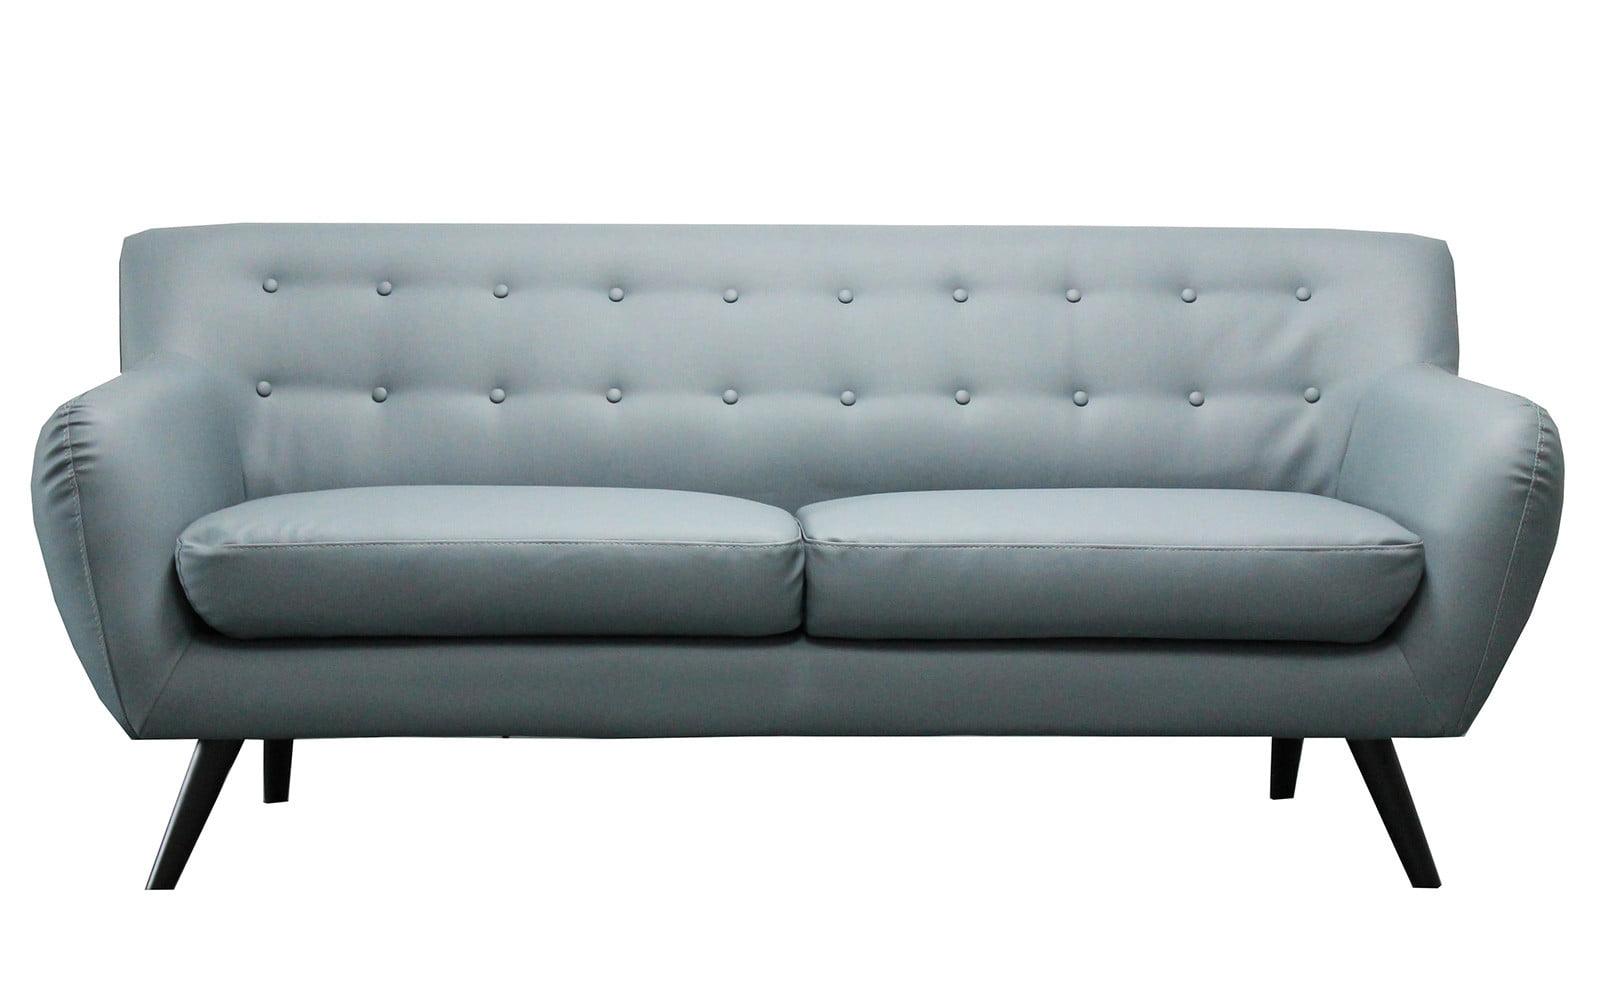 mid century modern tufted bonded leather sofa walmartcom. Interior Design Ideas. Home Design Ideas